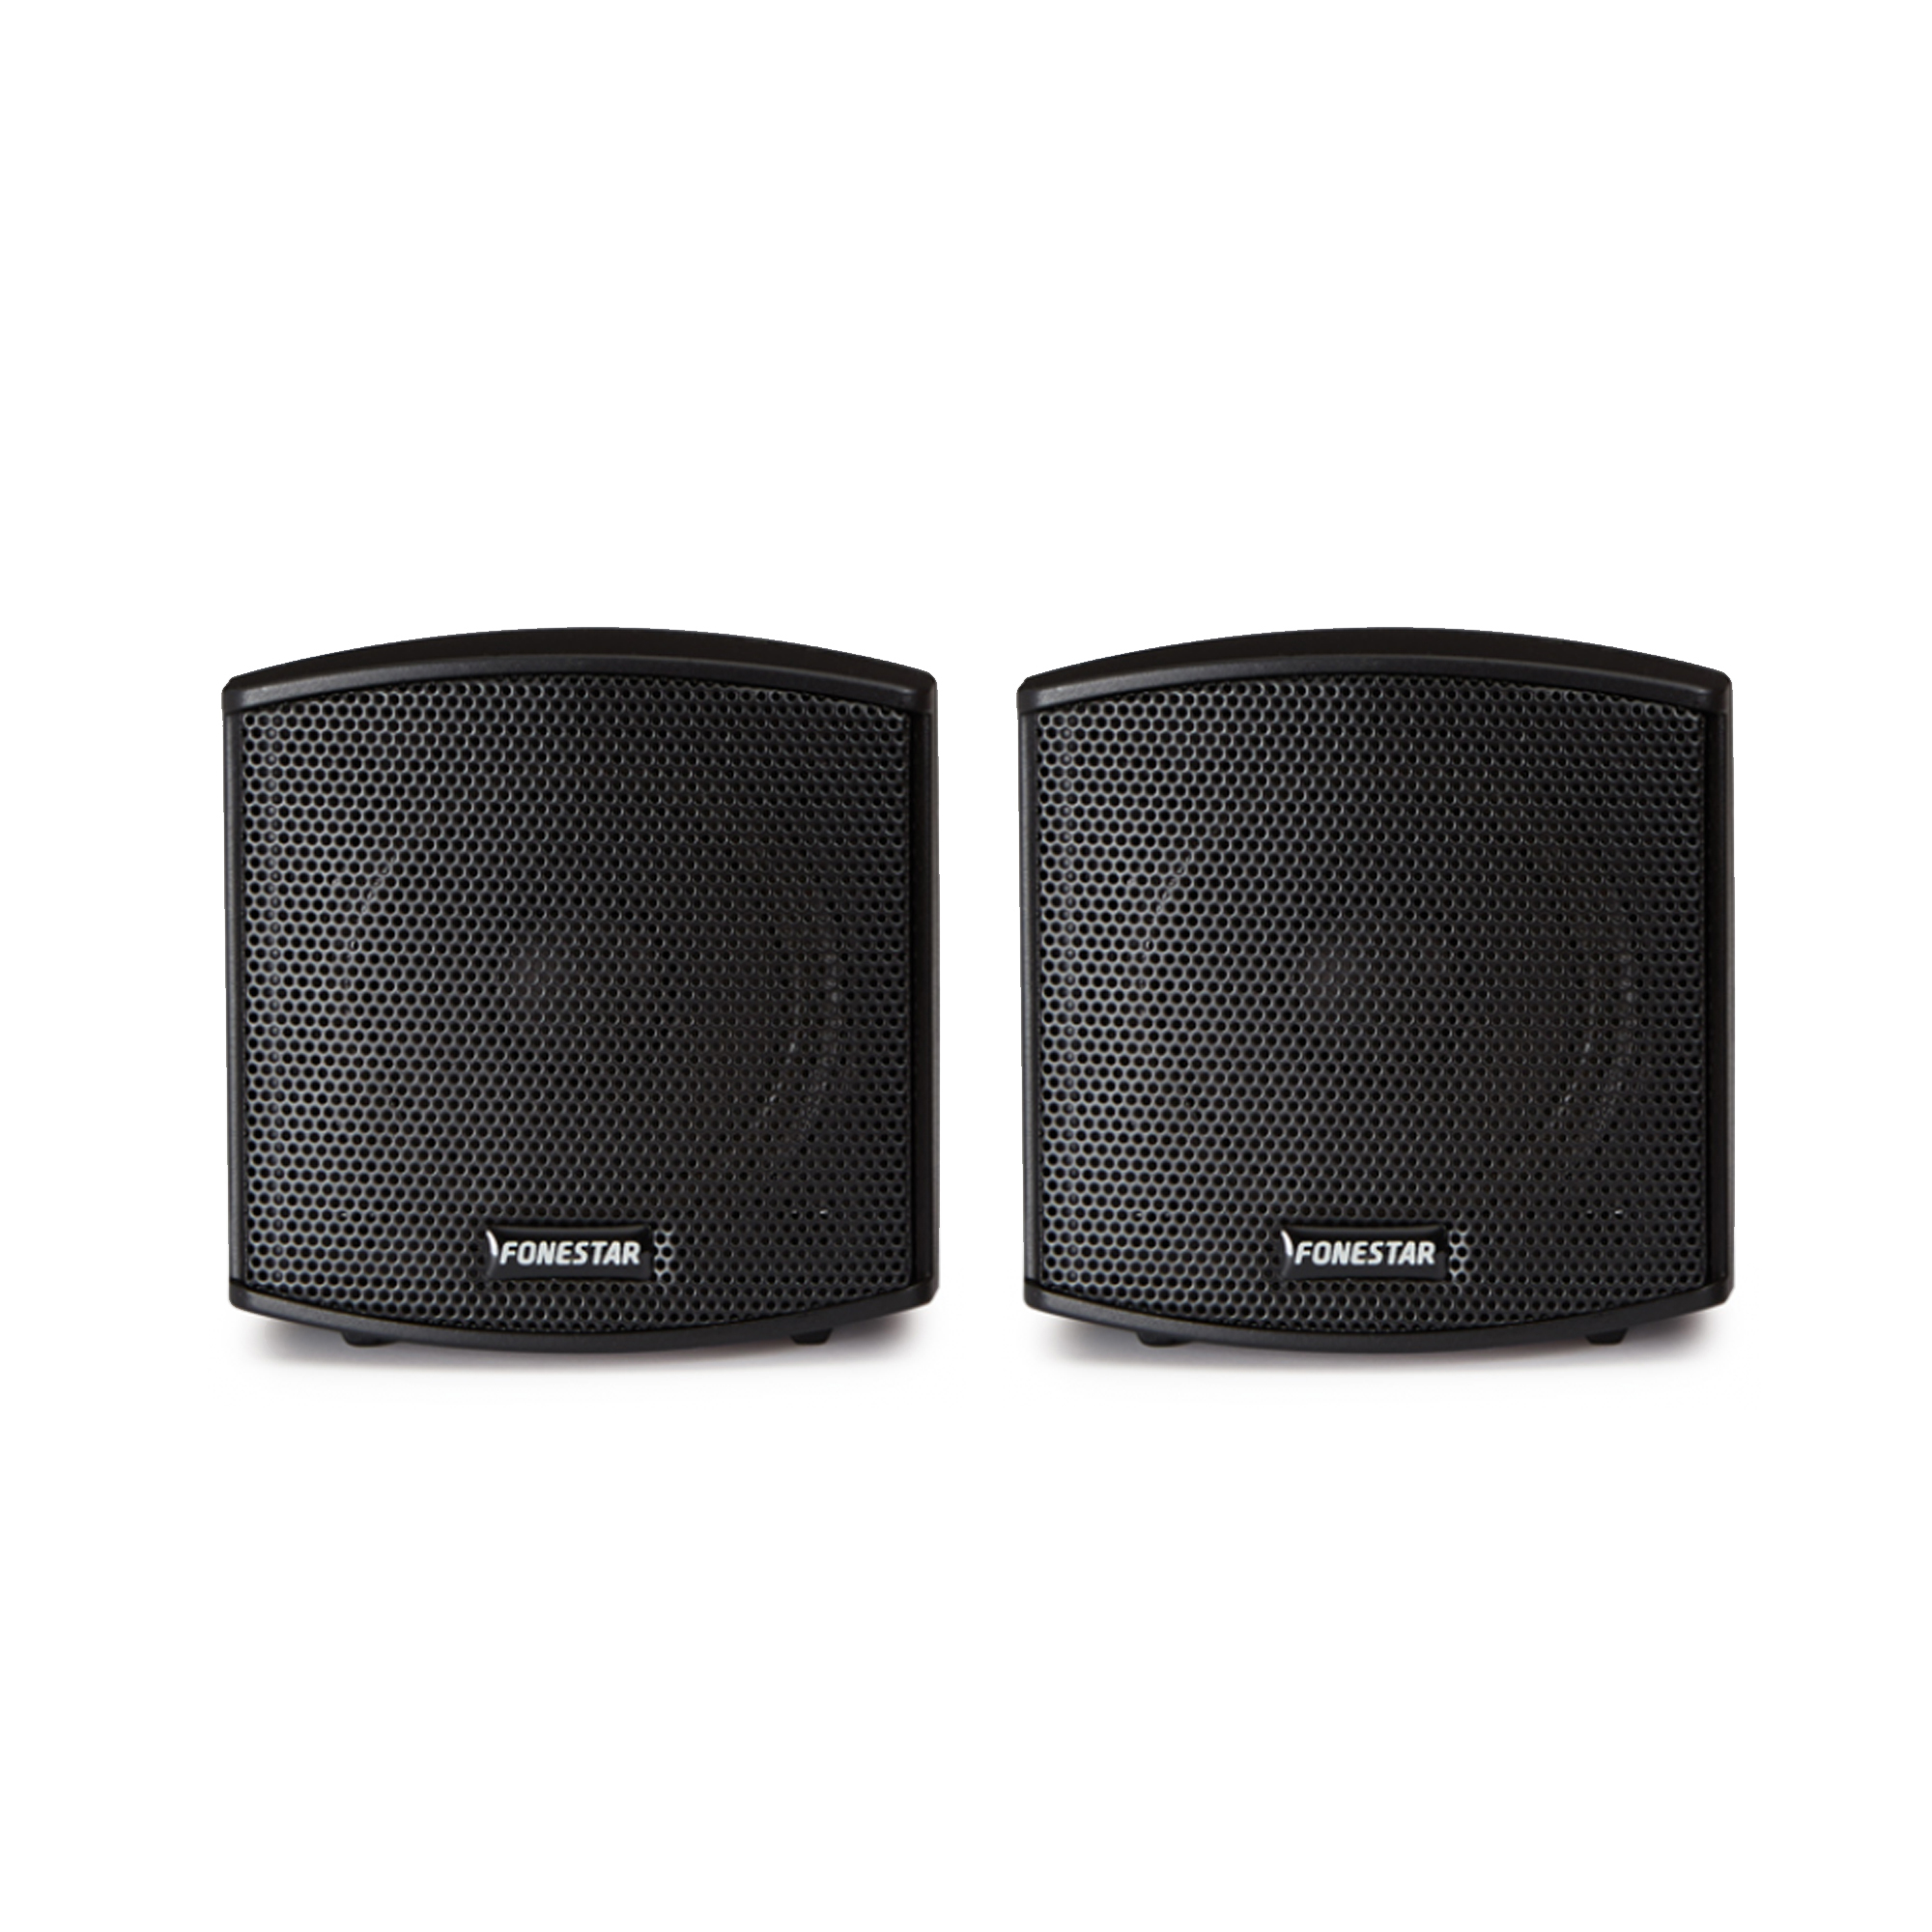 "Fonestar CUBE-62 2.5"" Black Wall Speakers Pair"